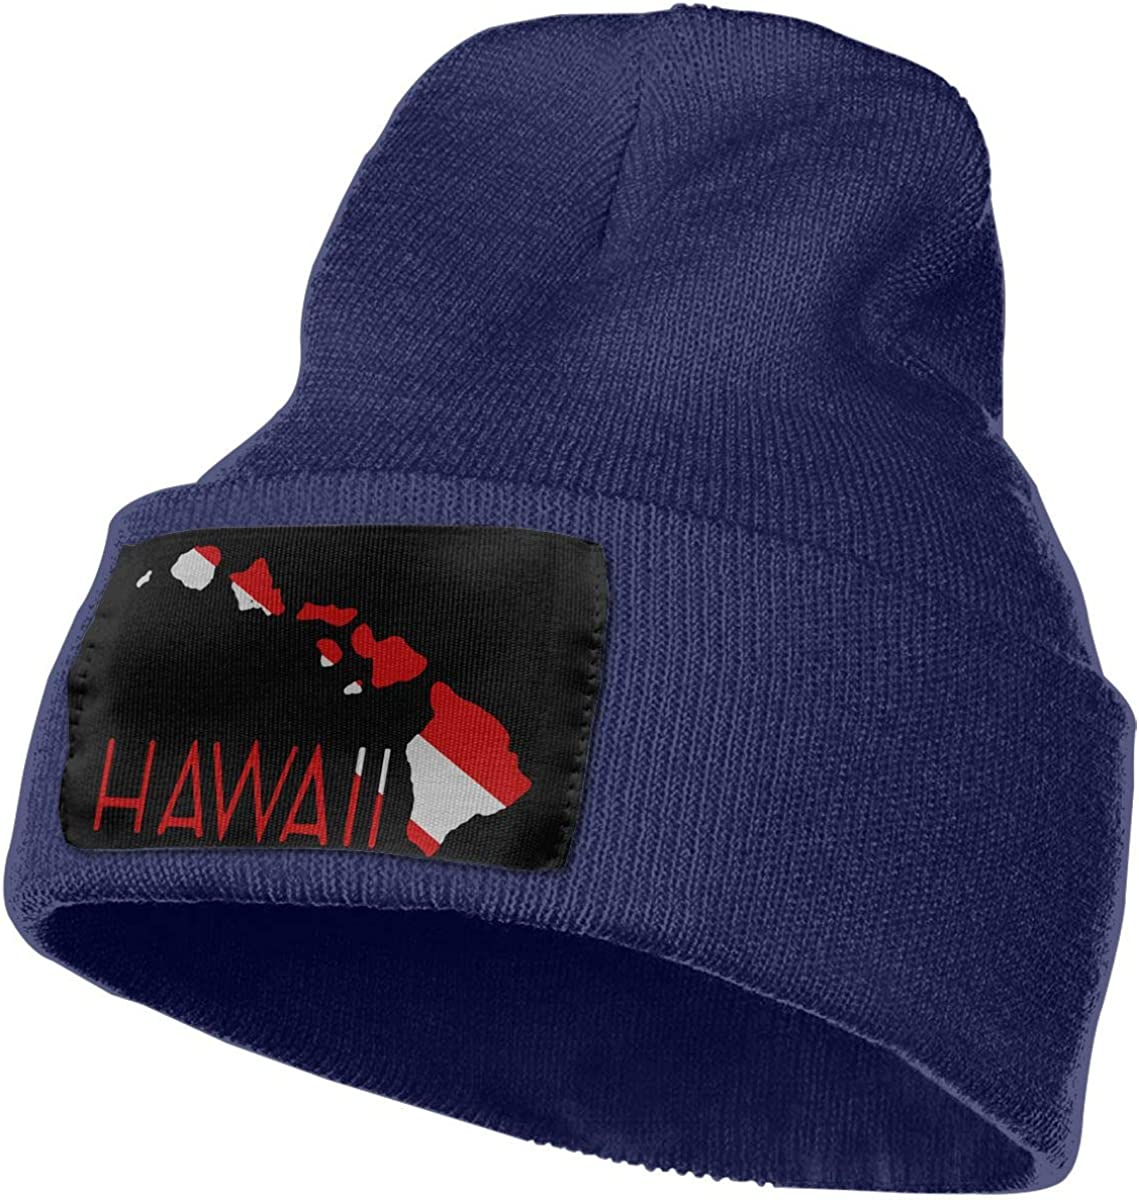 Hawaii Scuba Dive Flag Cute Ski Cap WHOO93@Y Unisex 100/% Acrylic Knitting Hat Cap